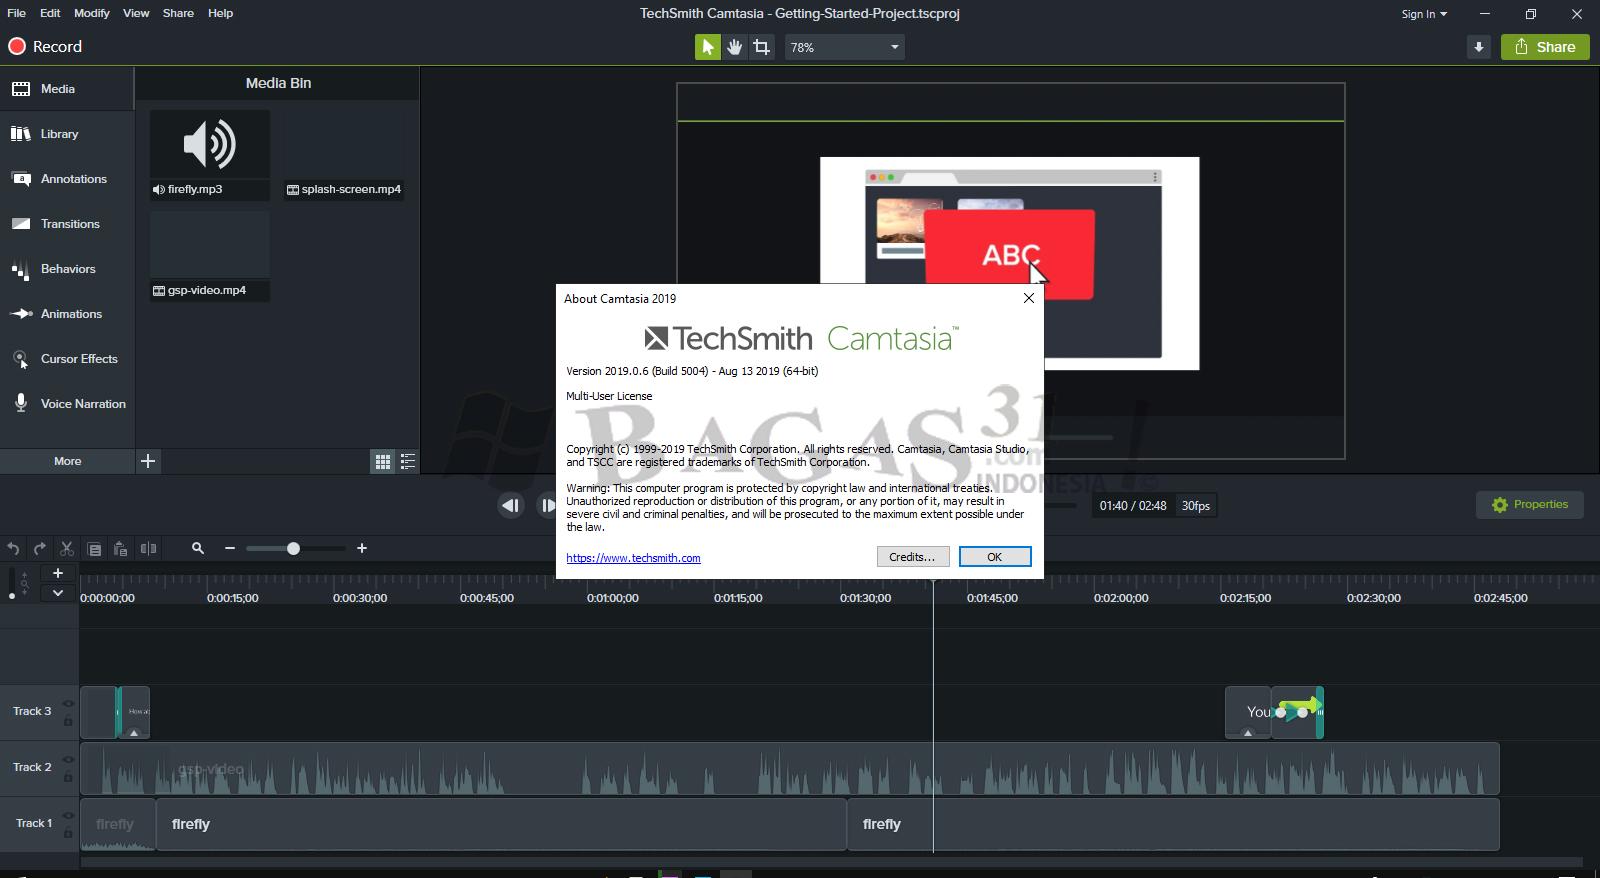 TechSmith Camtasia 2019.0.6 Build 5004 Full Version